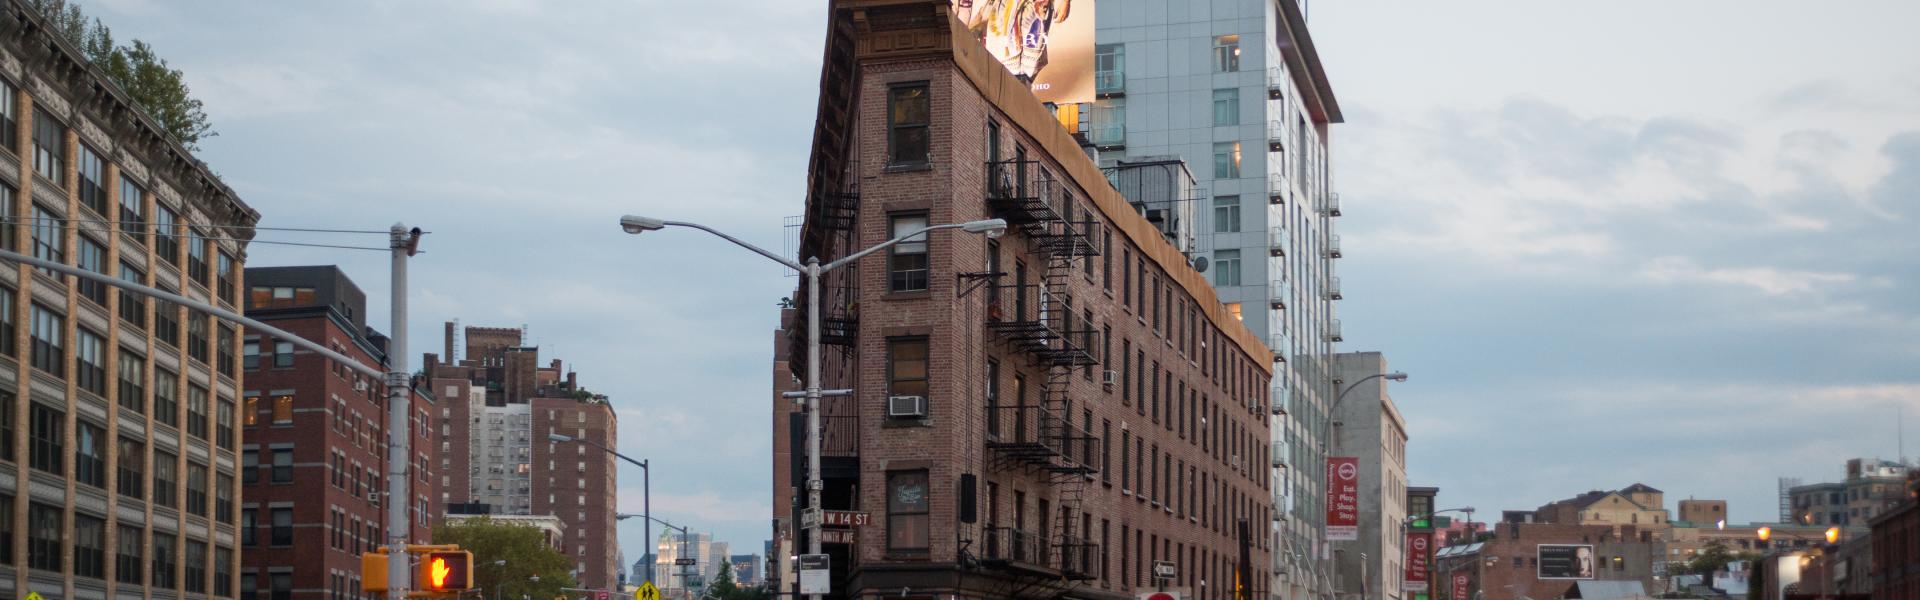 Meatpacking-Chelsea-Manhattan-NYC-Julienne-Schaer_642